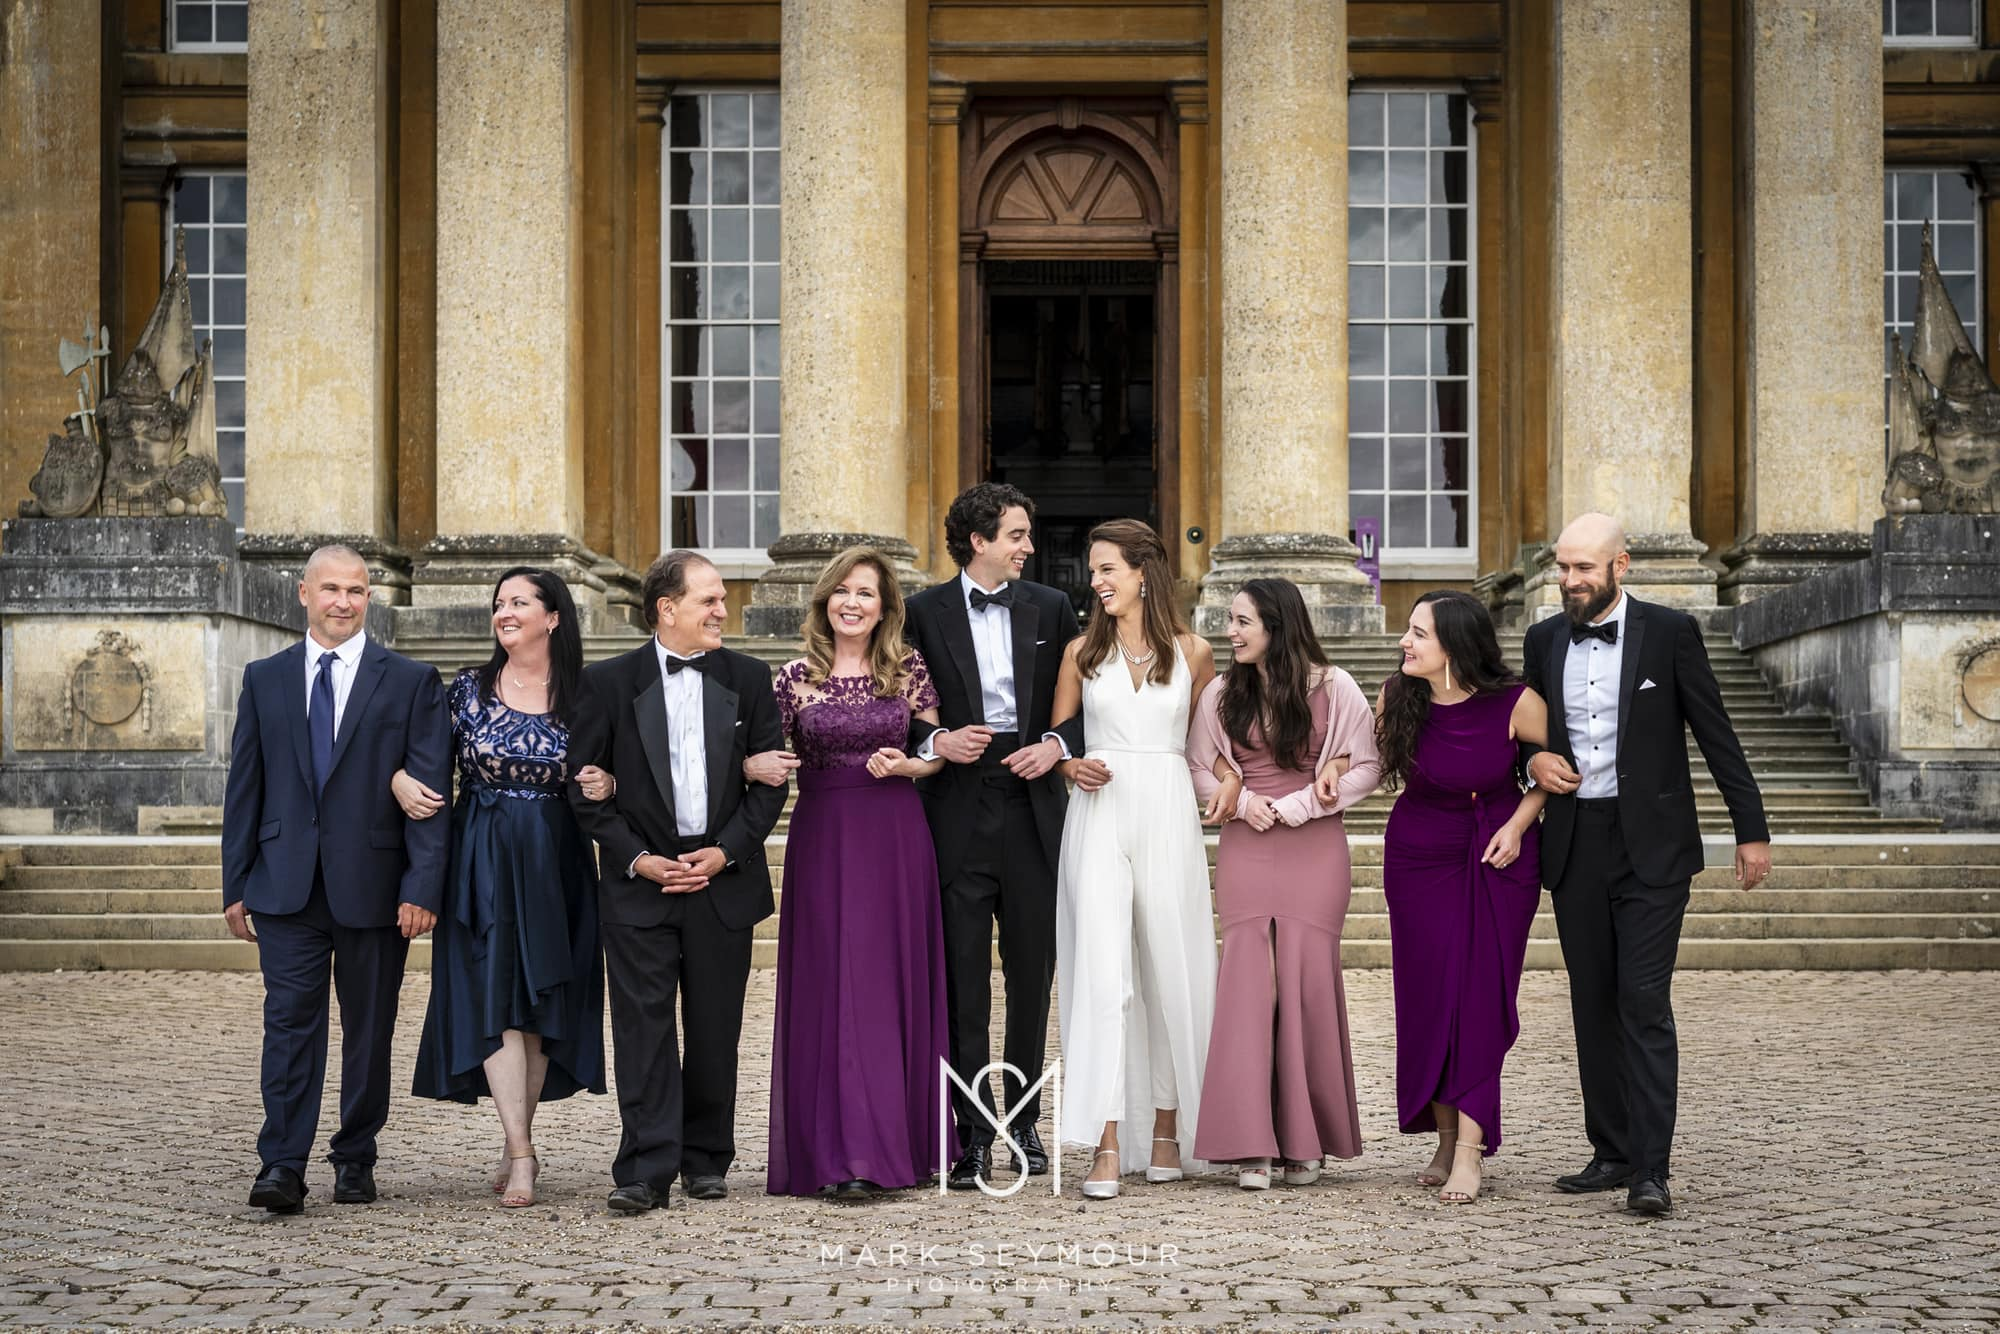 Wedding guests at Blenheim